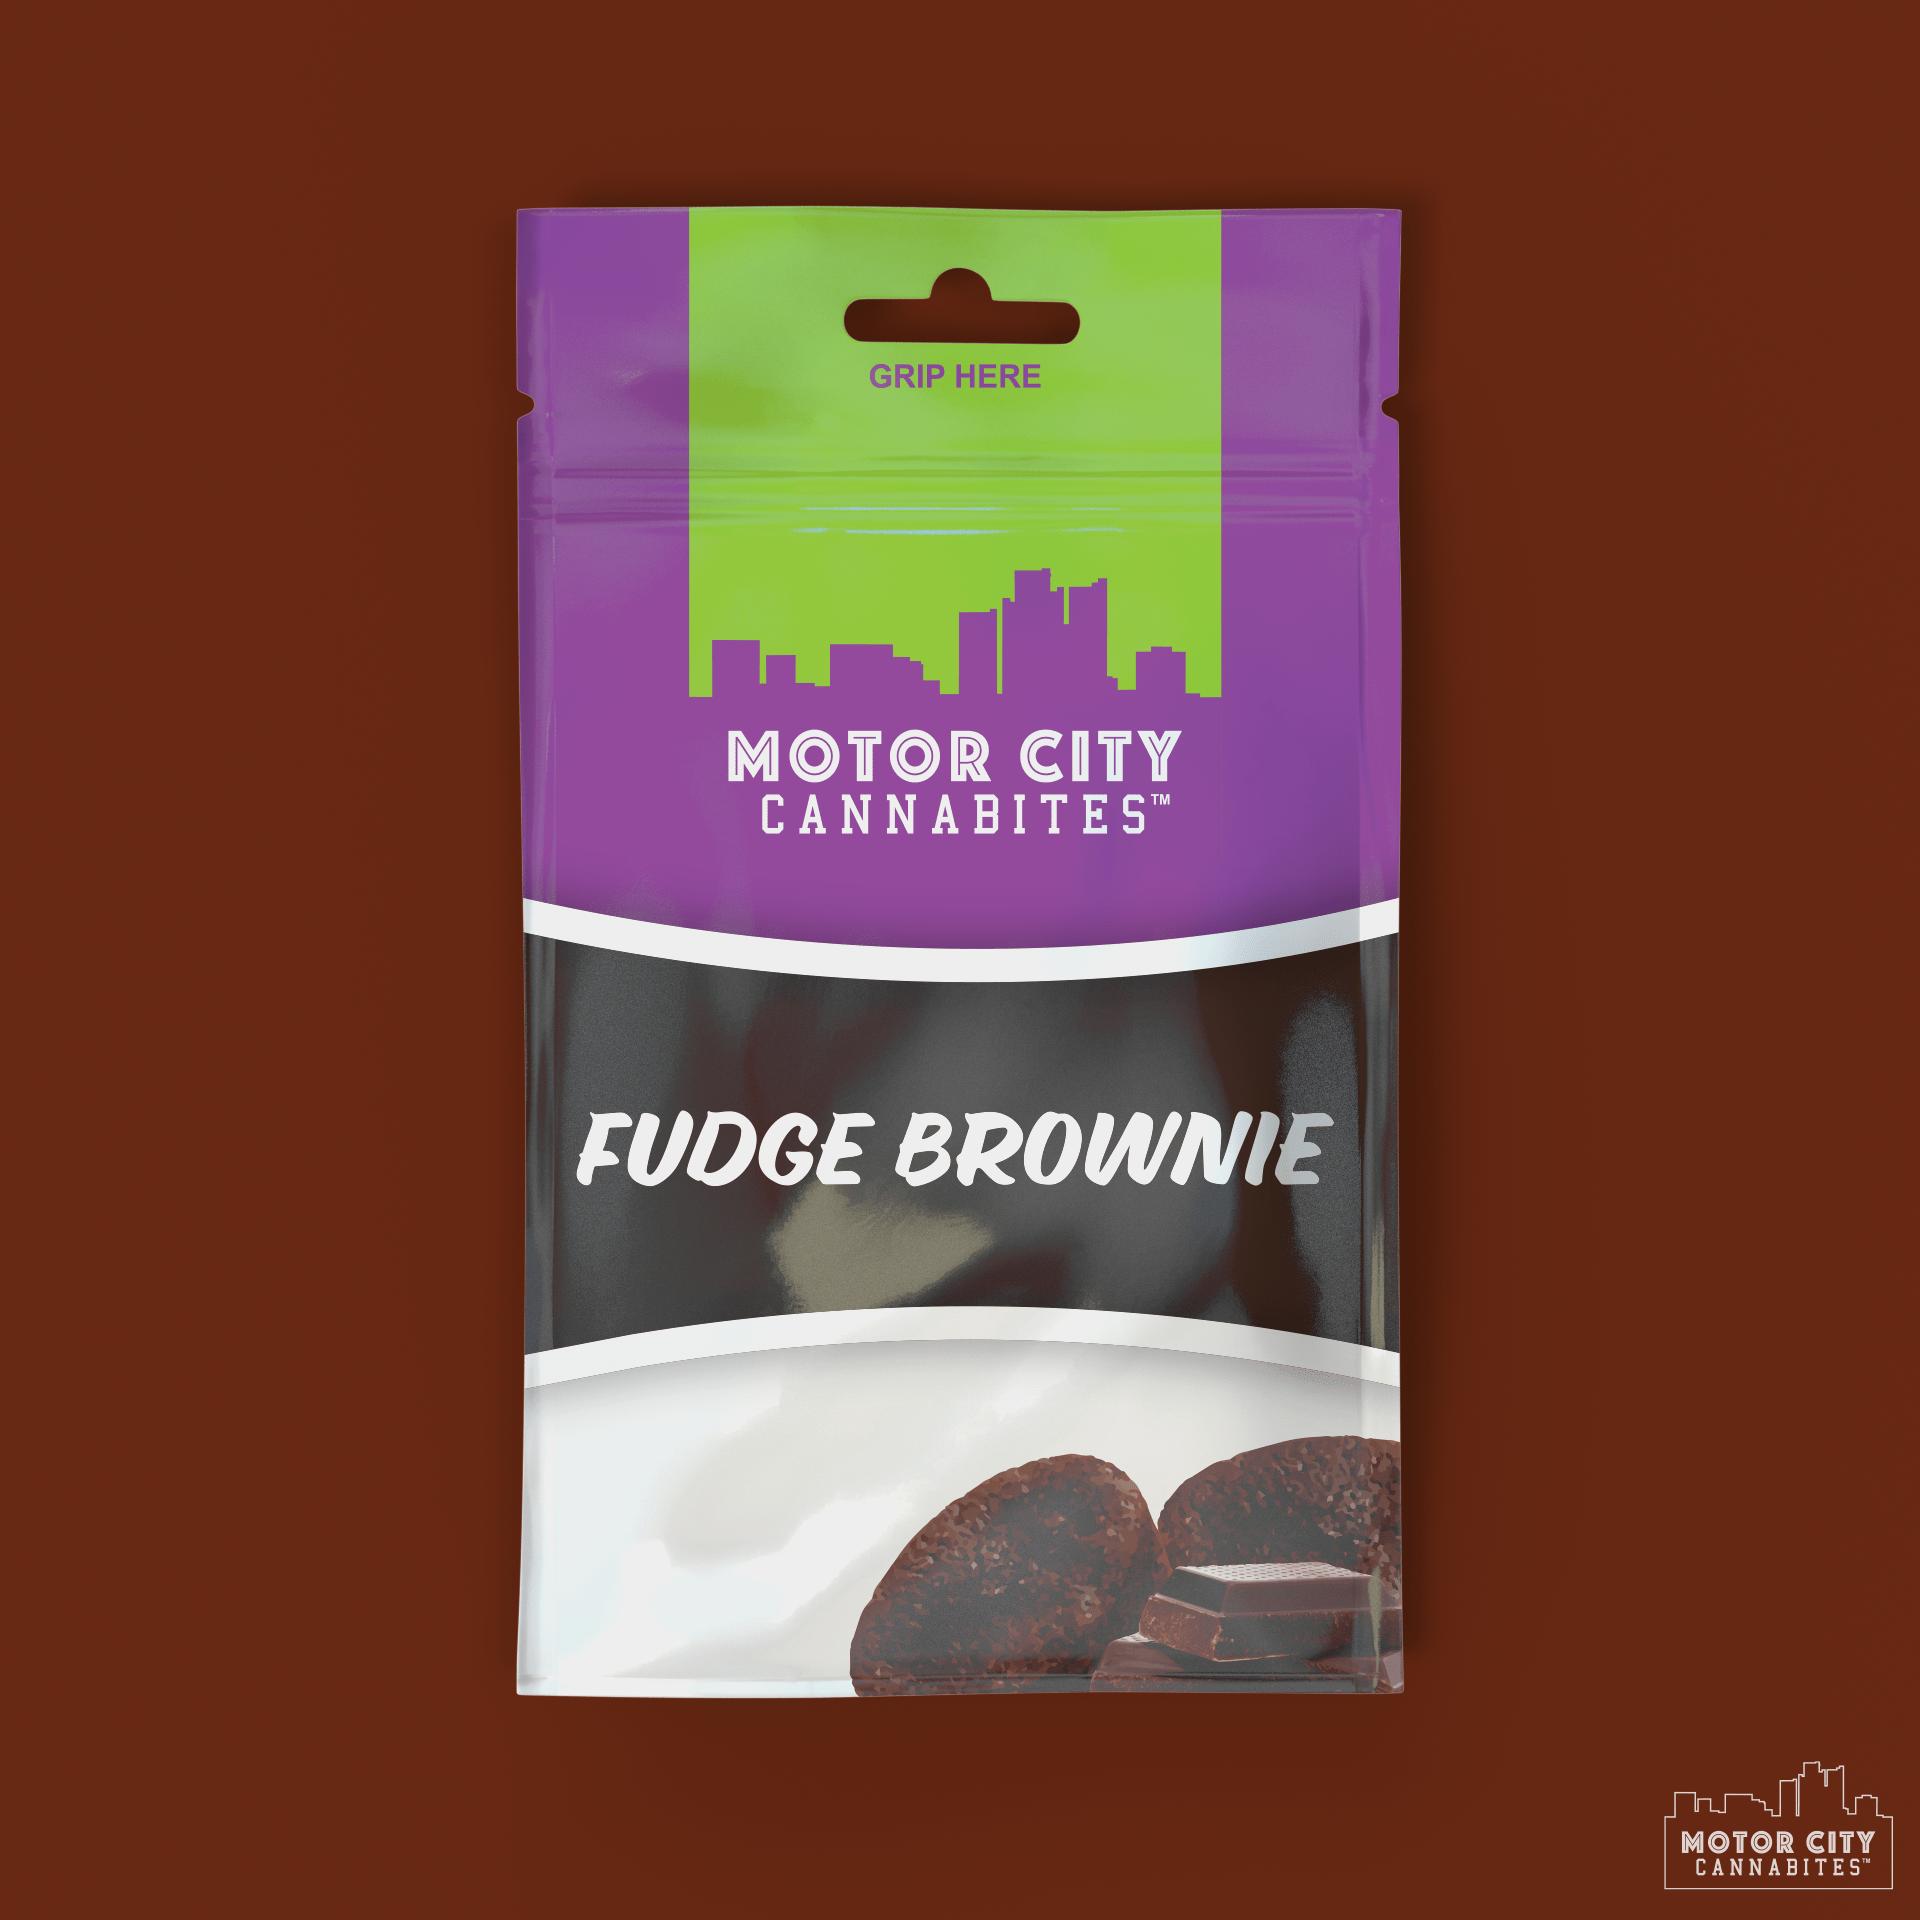 Fudge Brownie Cannabis Edible - Motor City Cannabites